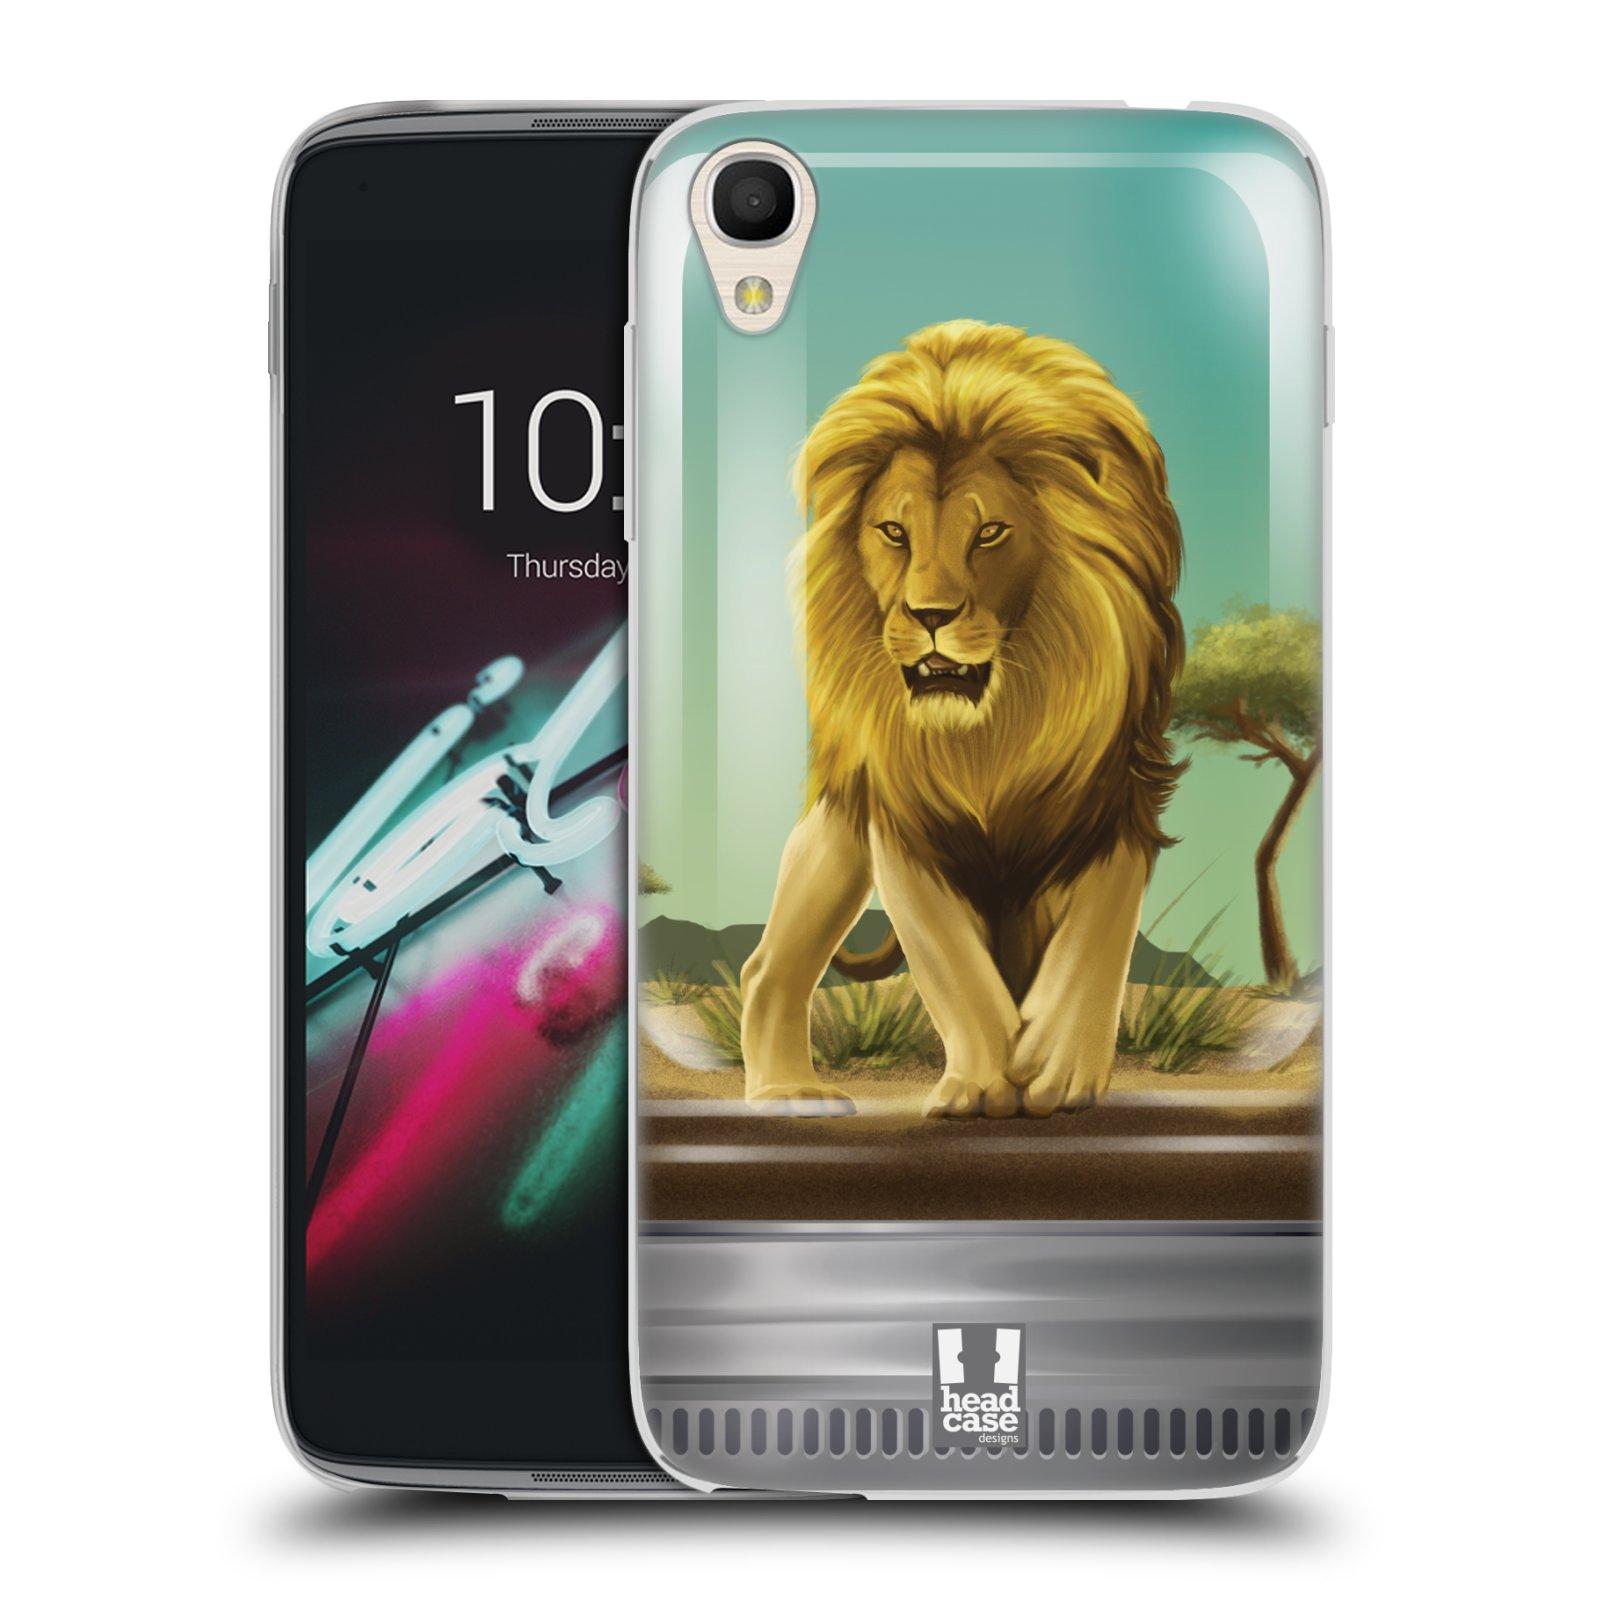 HEAD CASE silikonový obal na mobil Alcatel Idol 3 OT-6039Y (4.7) vzor Zvířátka v těžítku lev